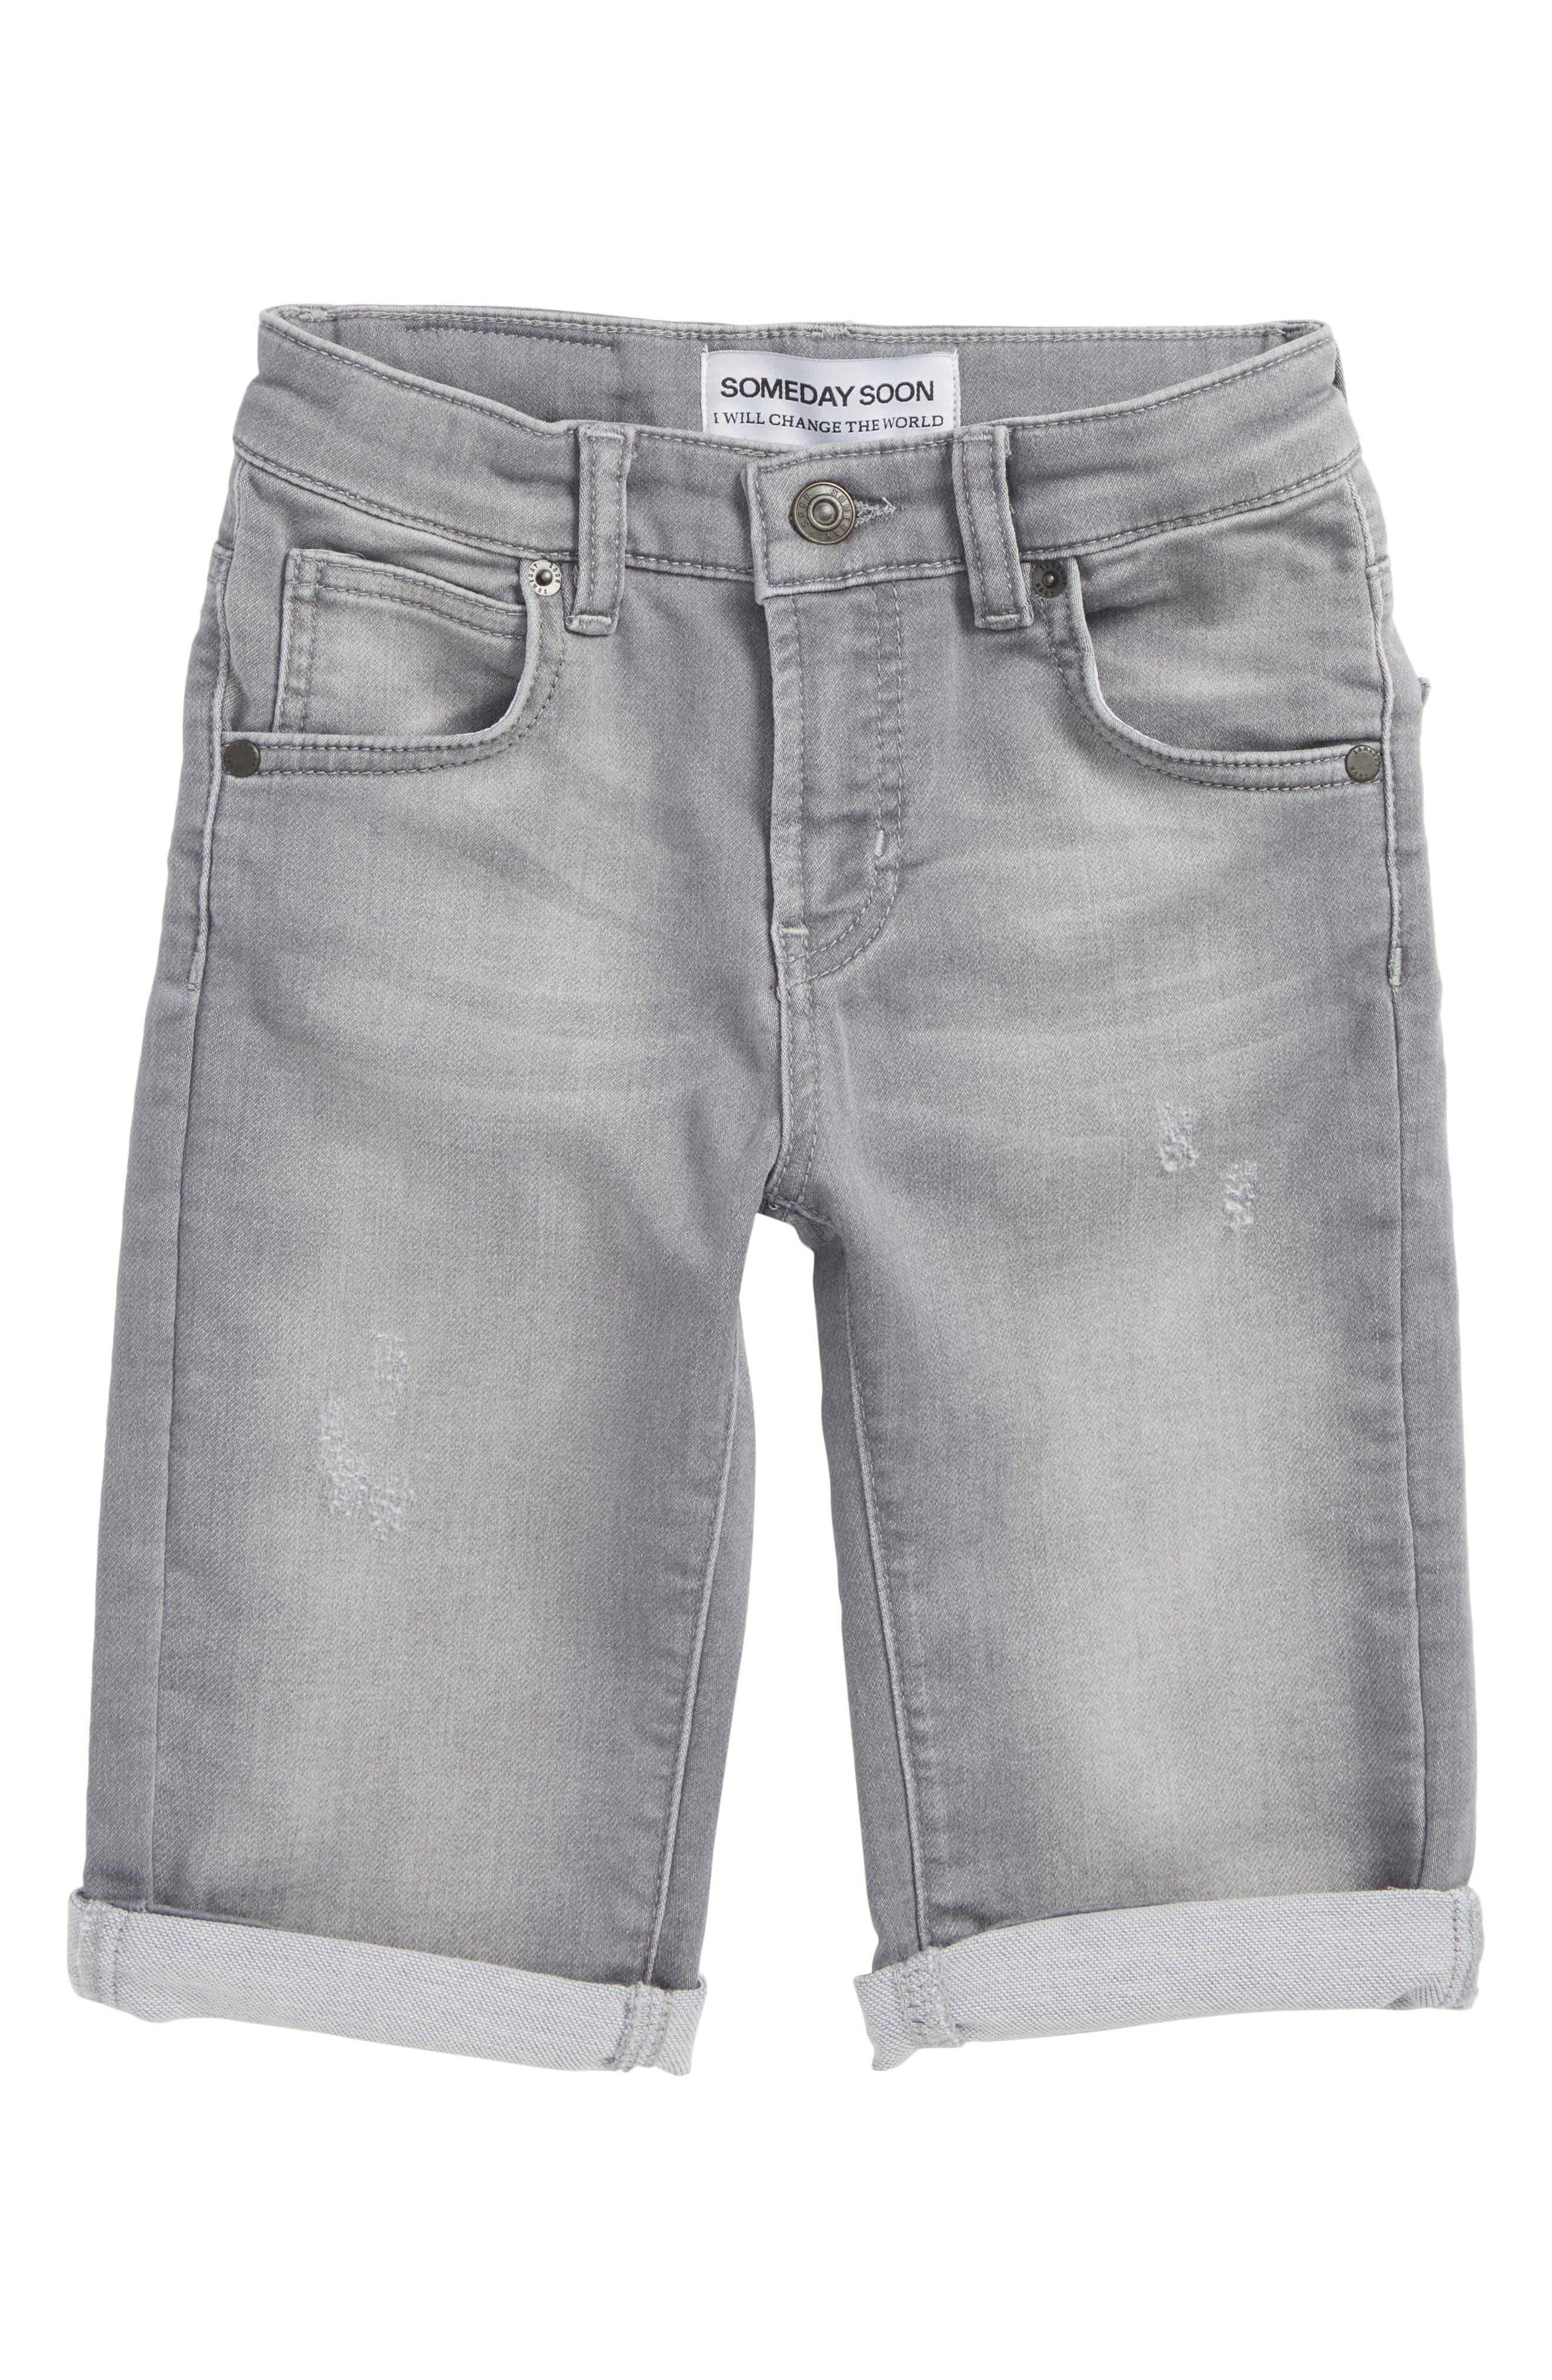 Carl Denim Shorts,                         Main,                         color, Grey